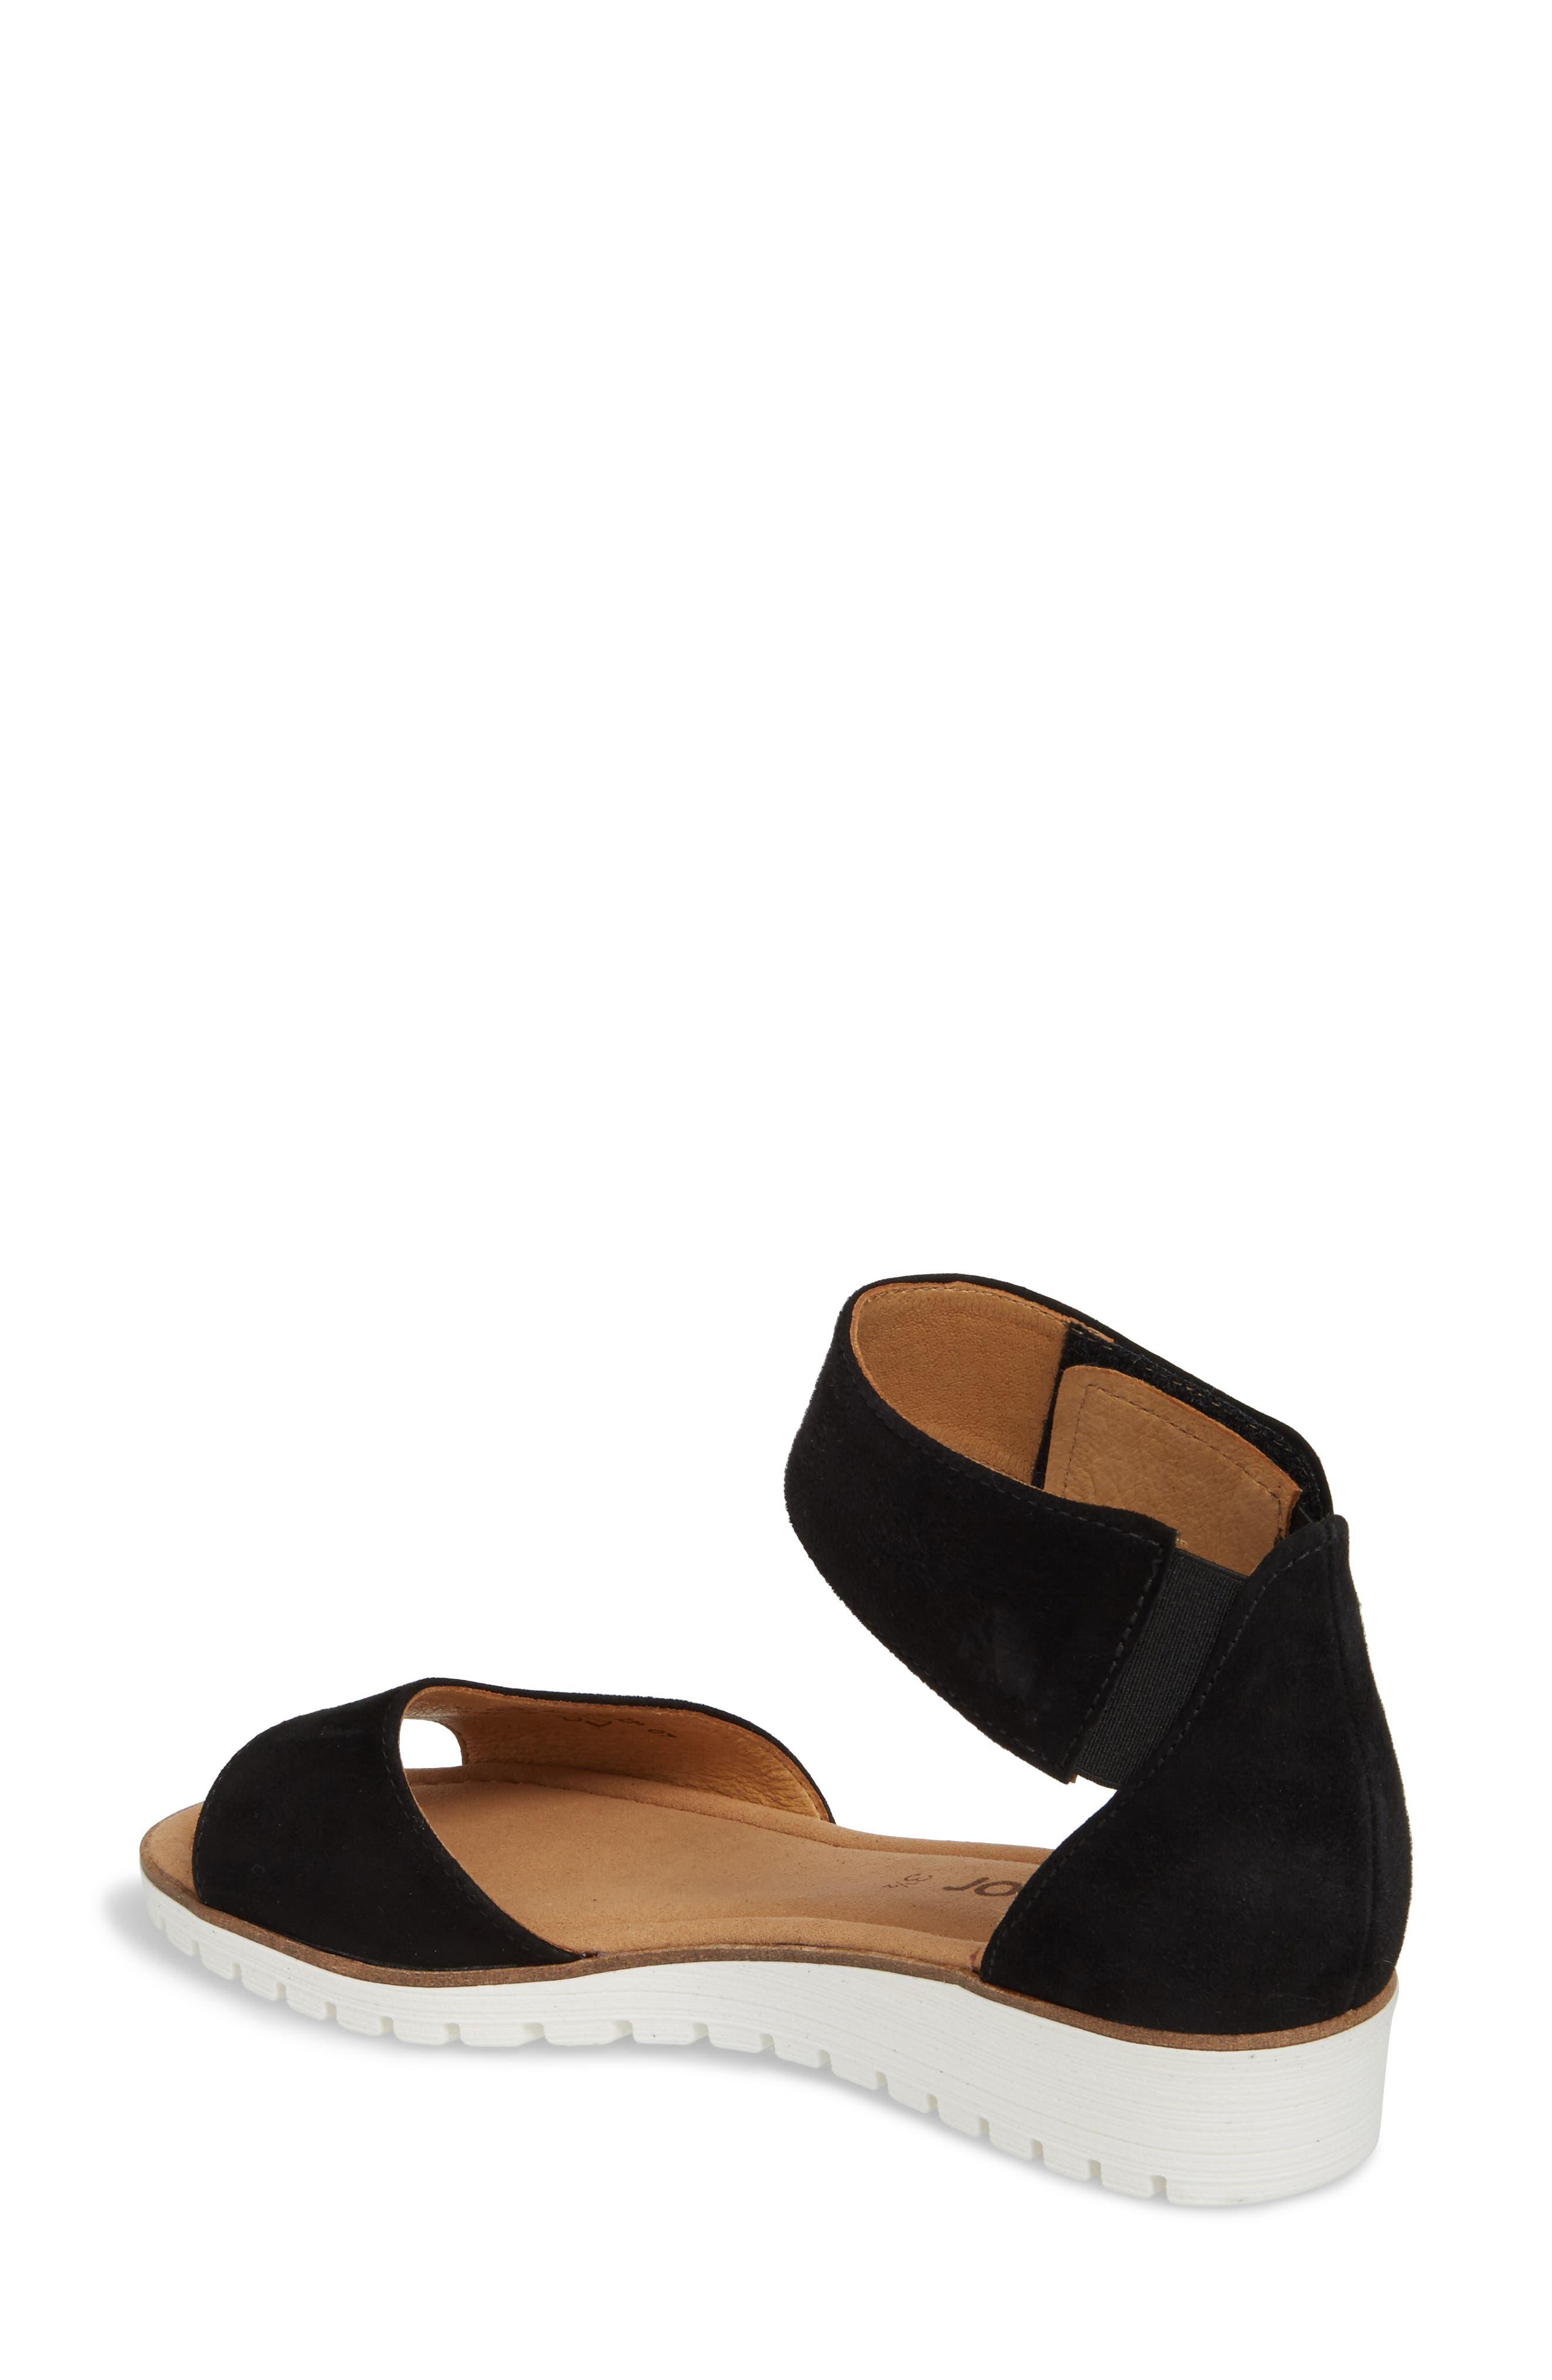 Ankle Strap Sandal,                             Alternate thumbnail 2, color,                             BLACK SUEDE